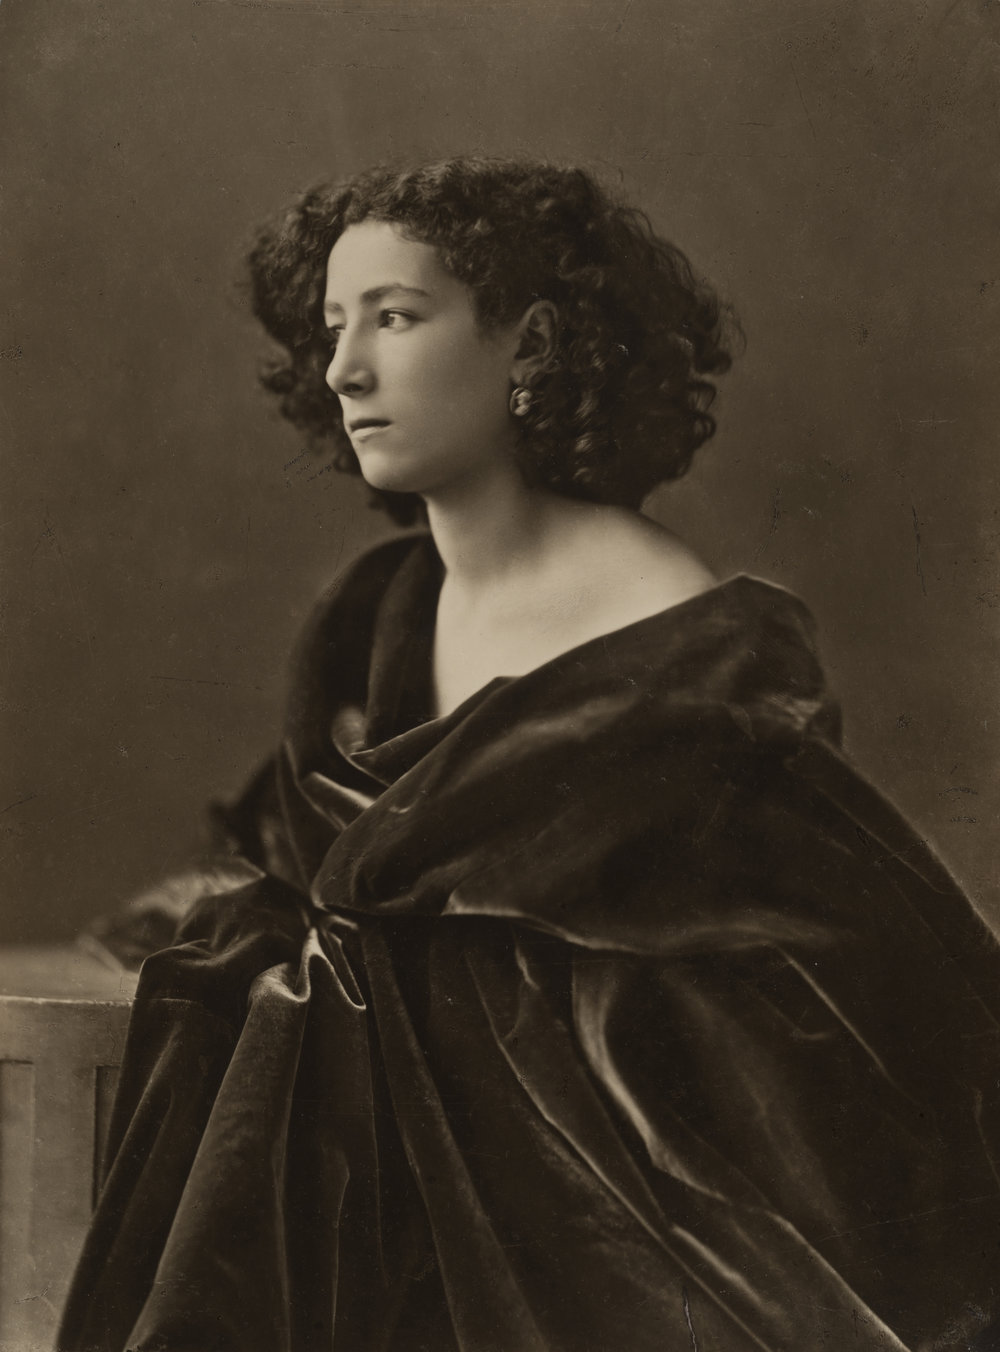 Portrait of Sarah Bernhardt, circa 1866